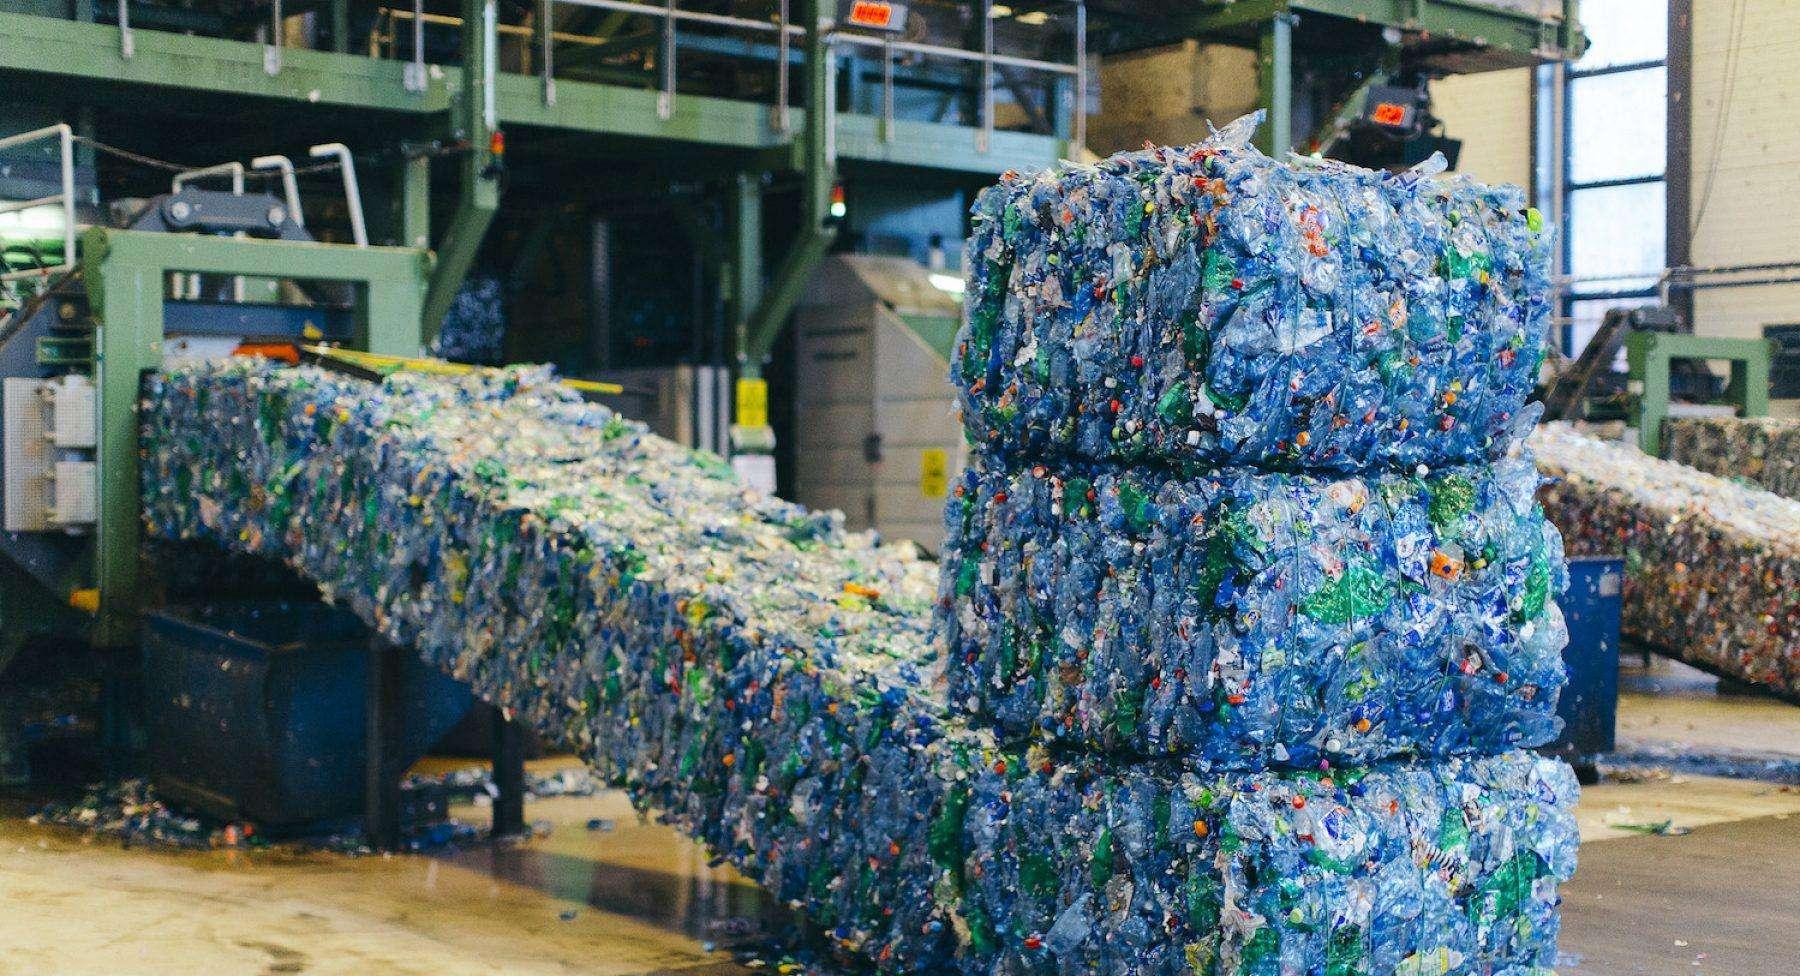 Reliance Industries' New Initiative: पर्यावरण को बचाने के लिए 500 करोड़ प्लास्टिक बोतलों को करेगी रिसाइकिल